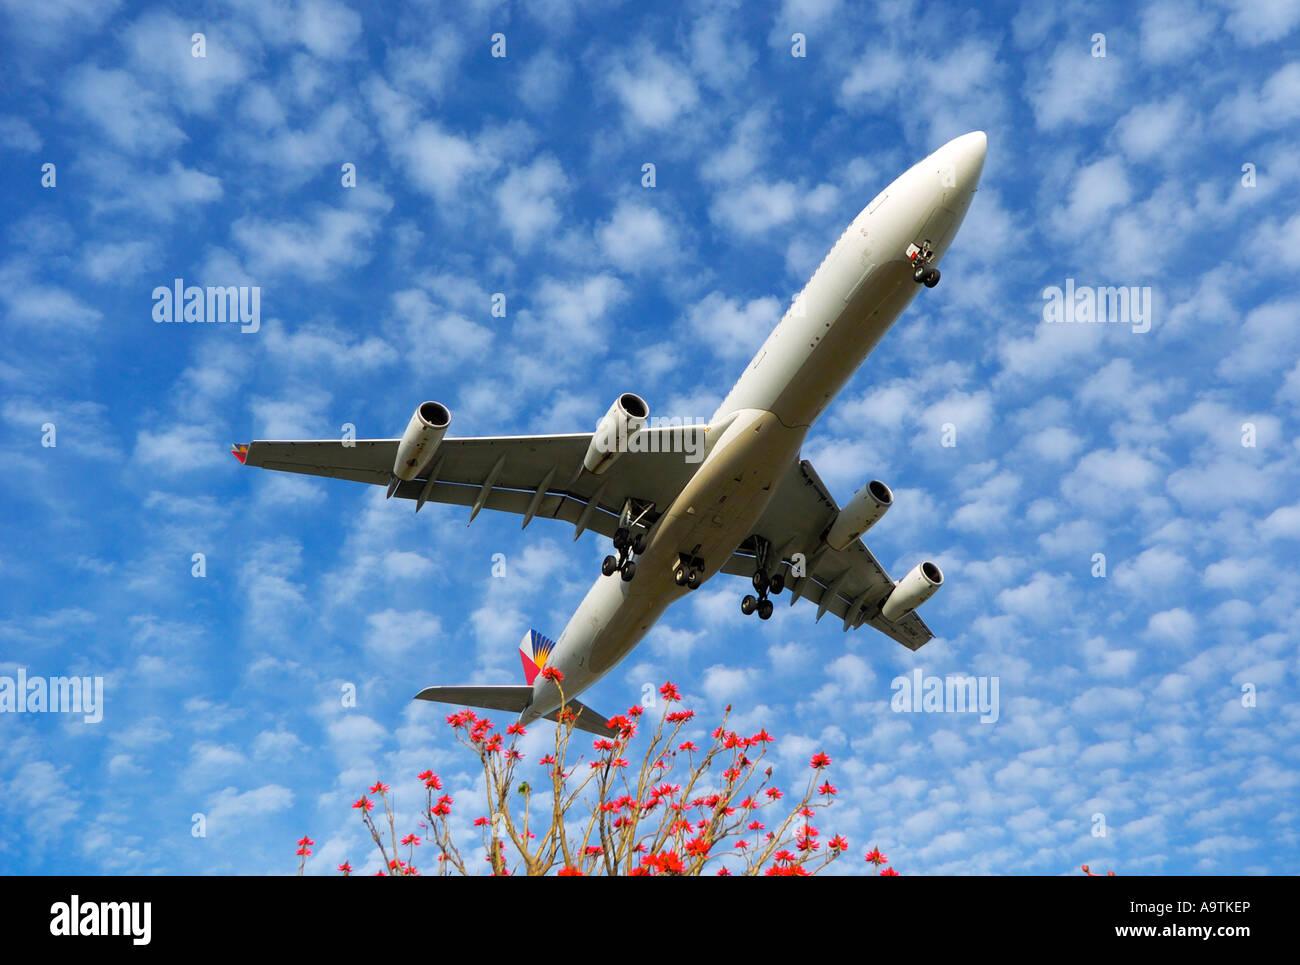 Flight Landing Lax Stock Photos & Flight Landing Lax Stock Images - Alamy